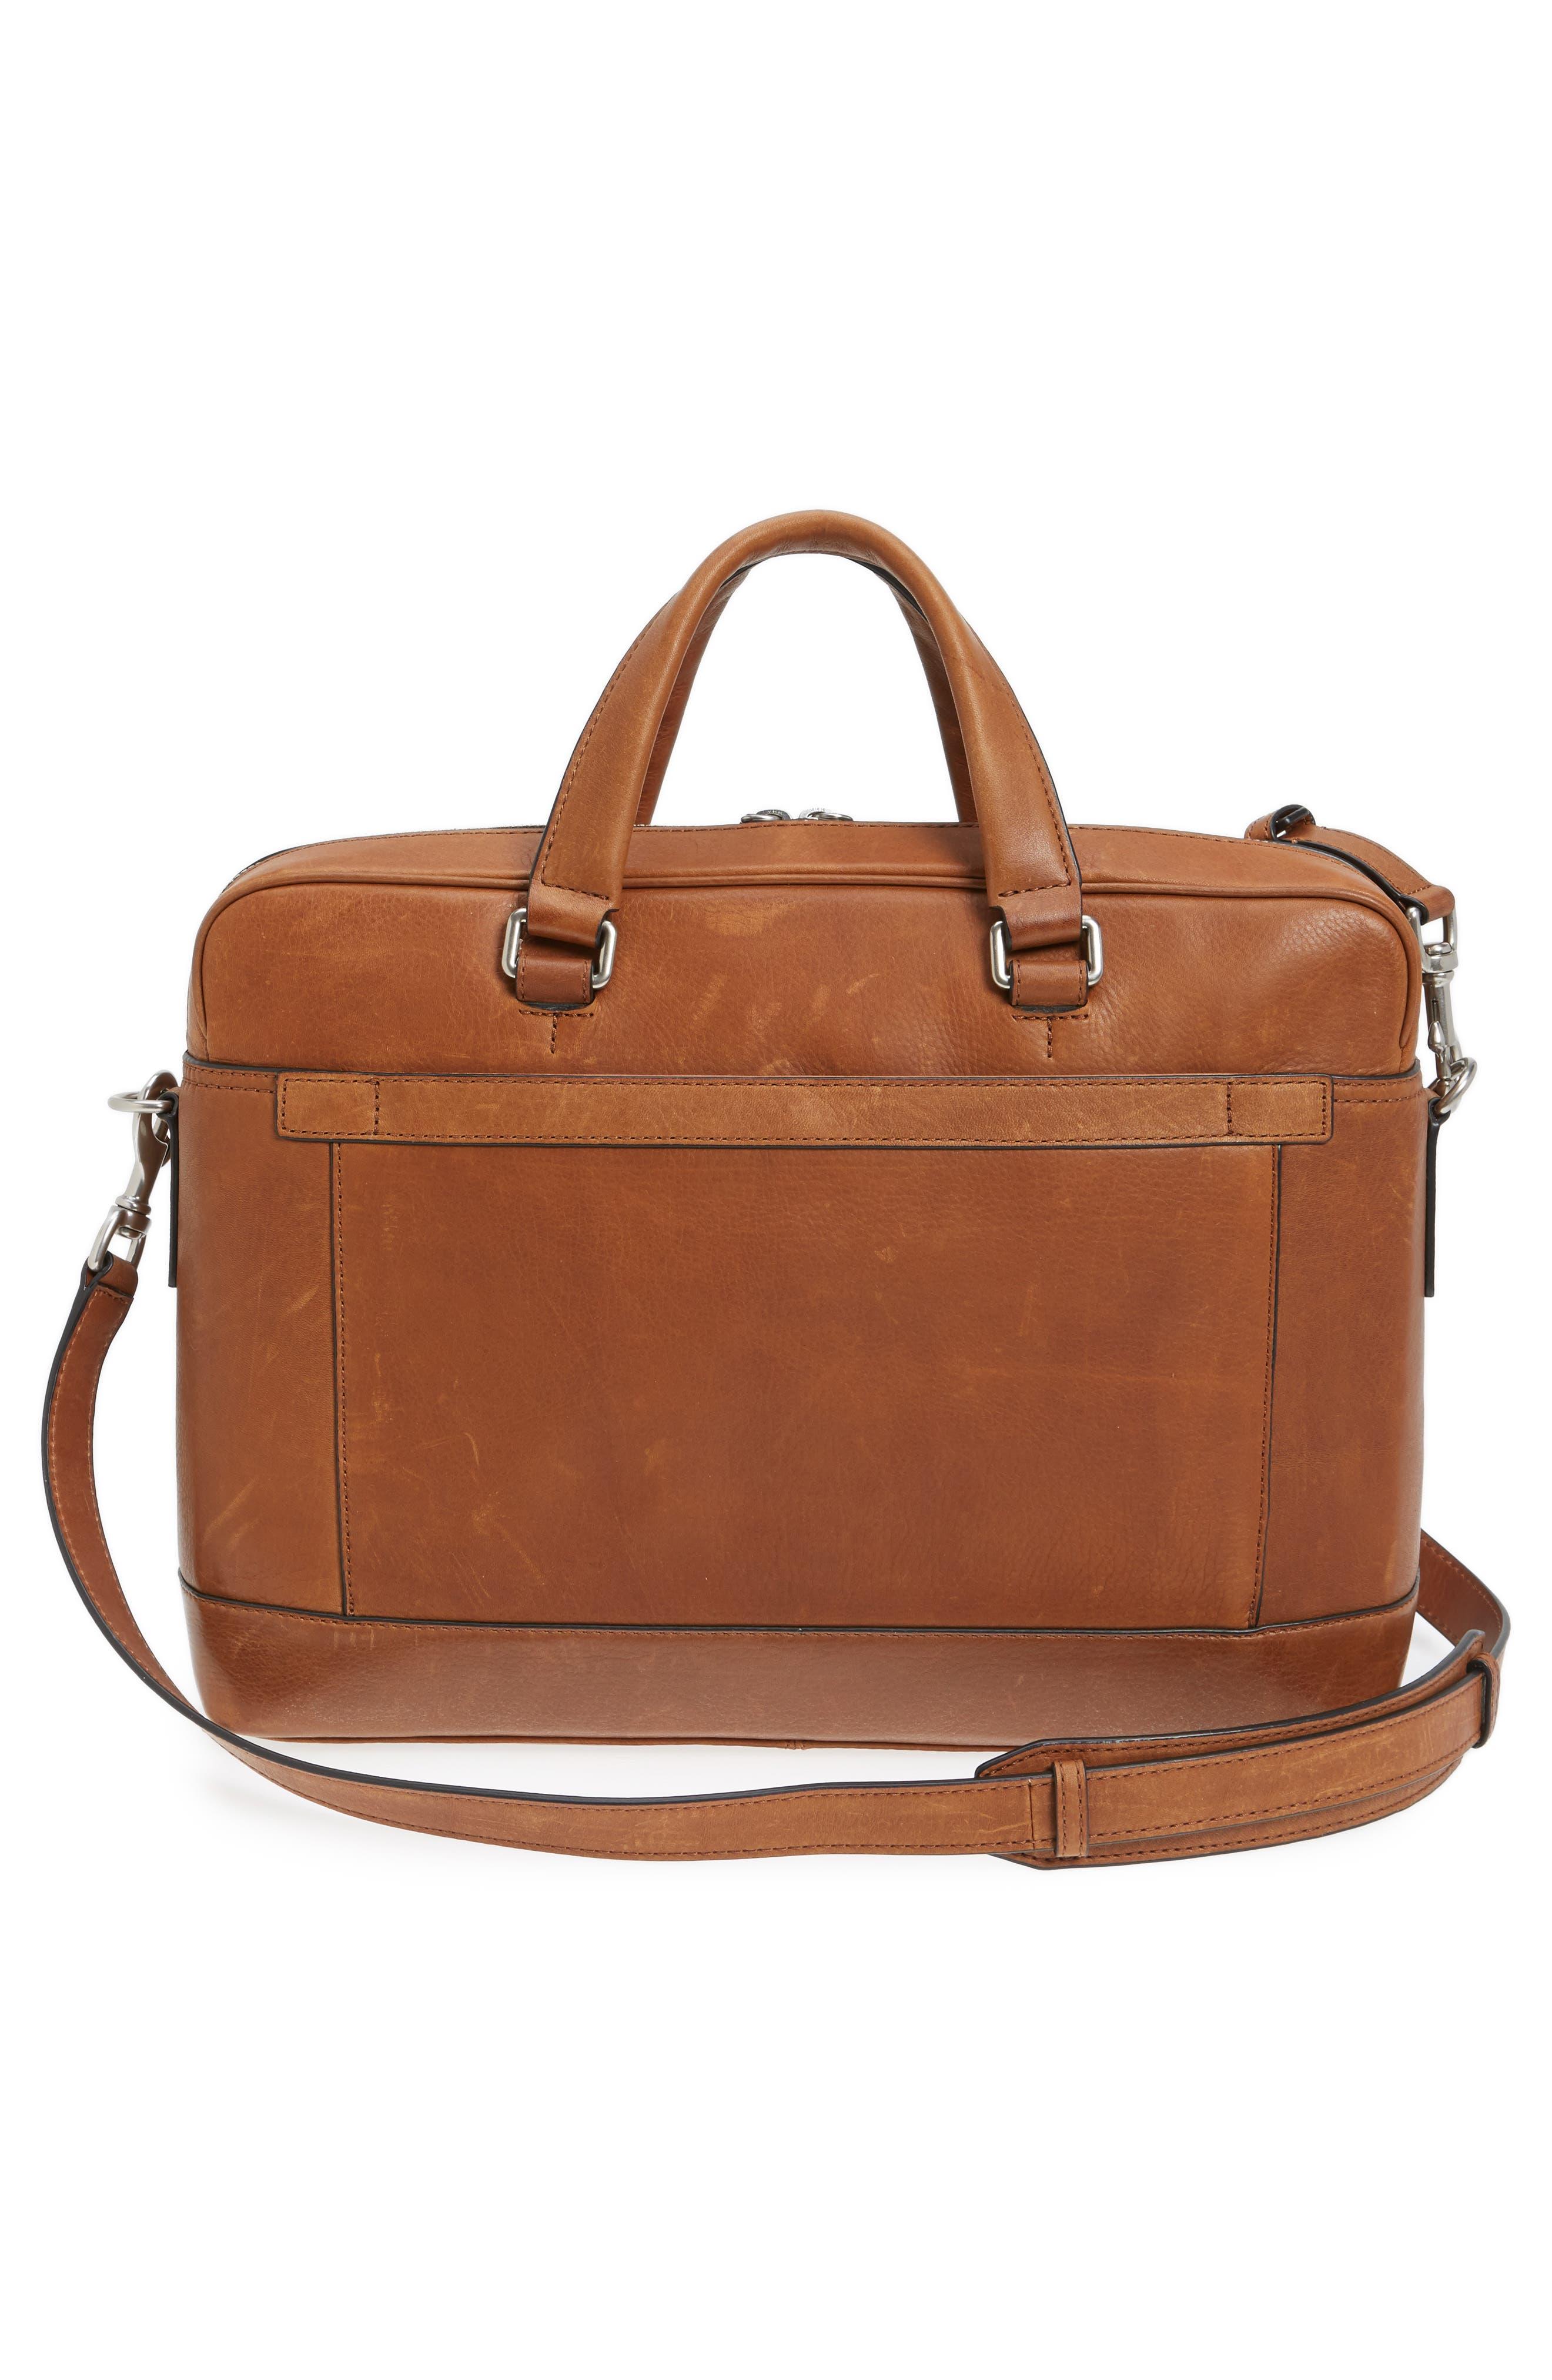 Oliver Leather Briefcase,                             Alternate thumbnail 3, color,                             Cognac